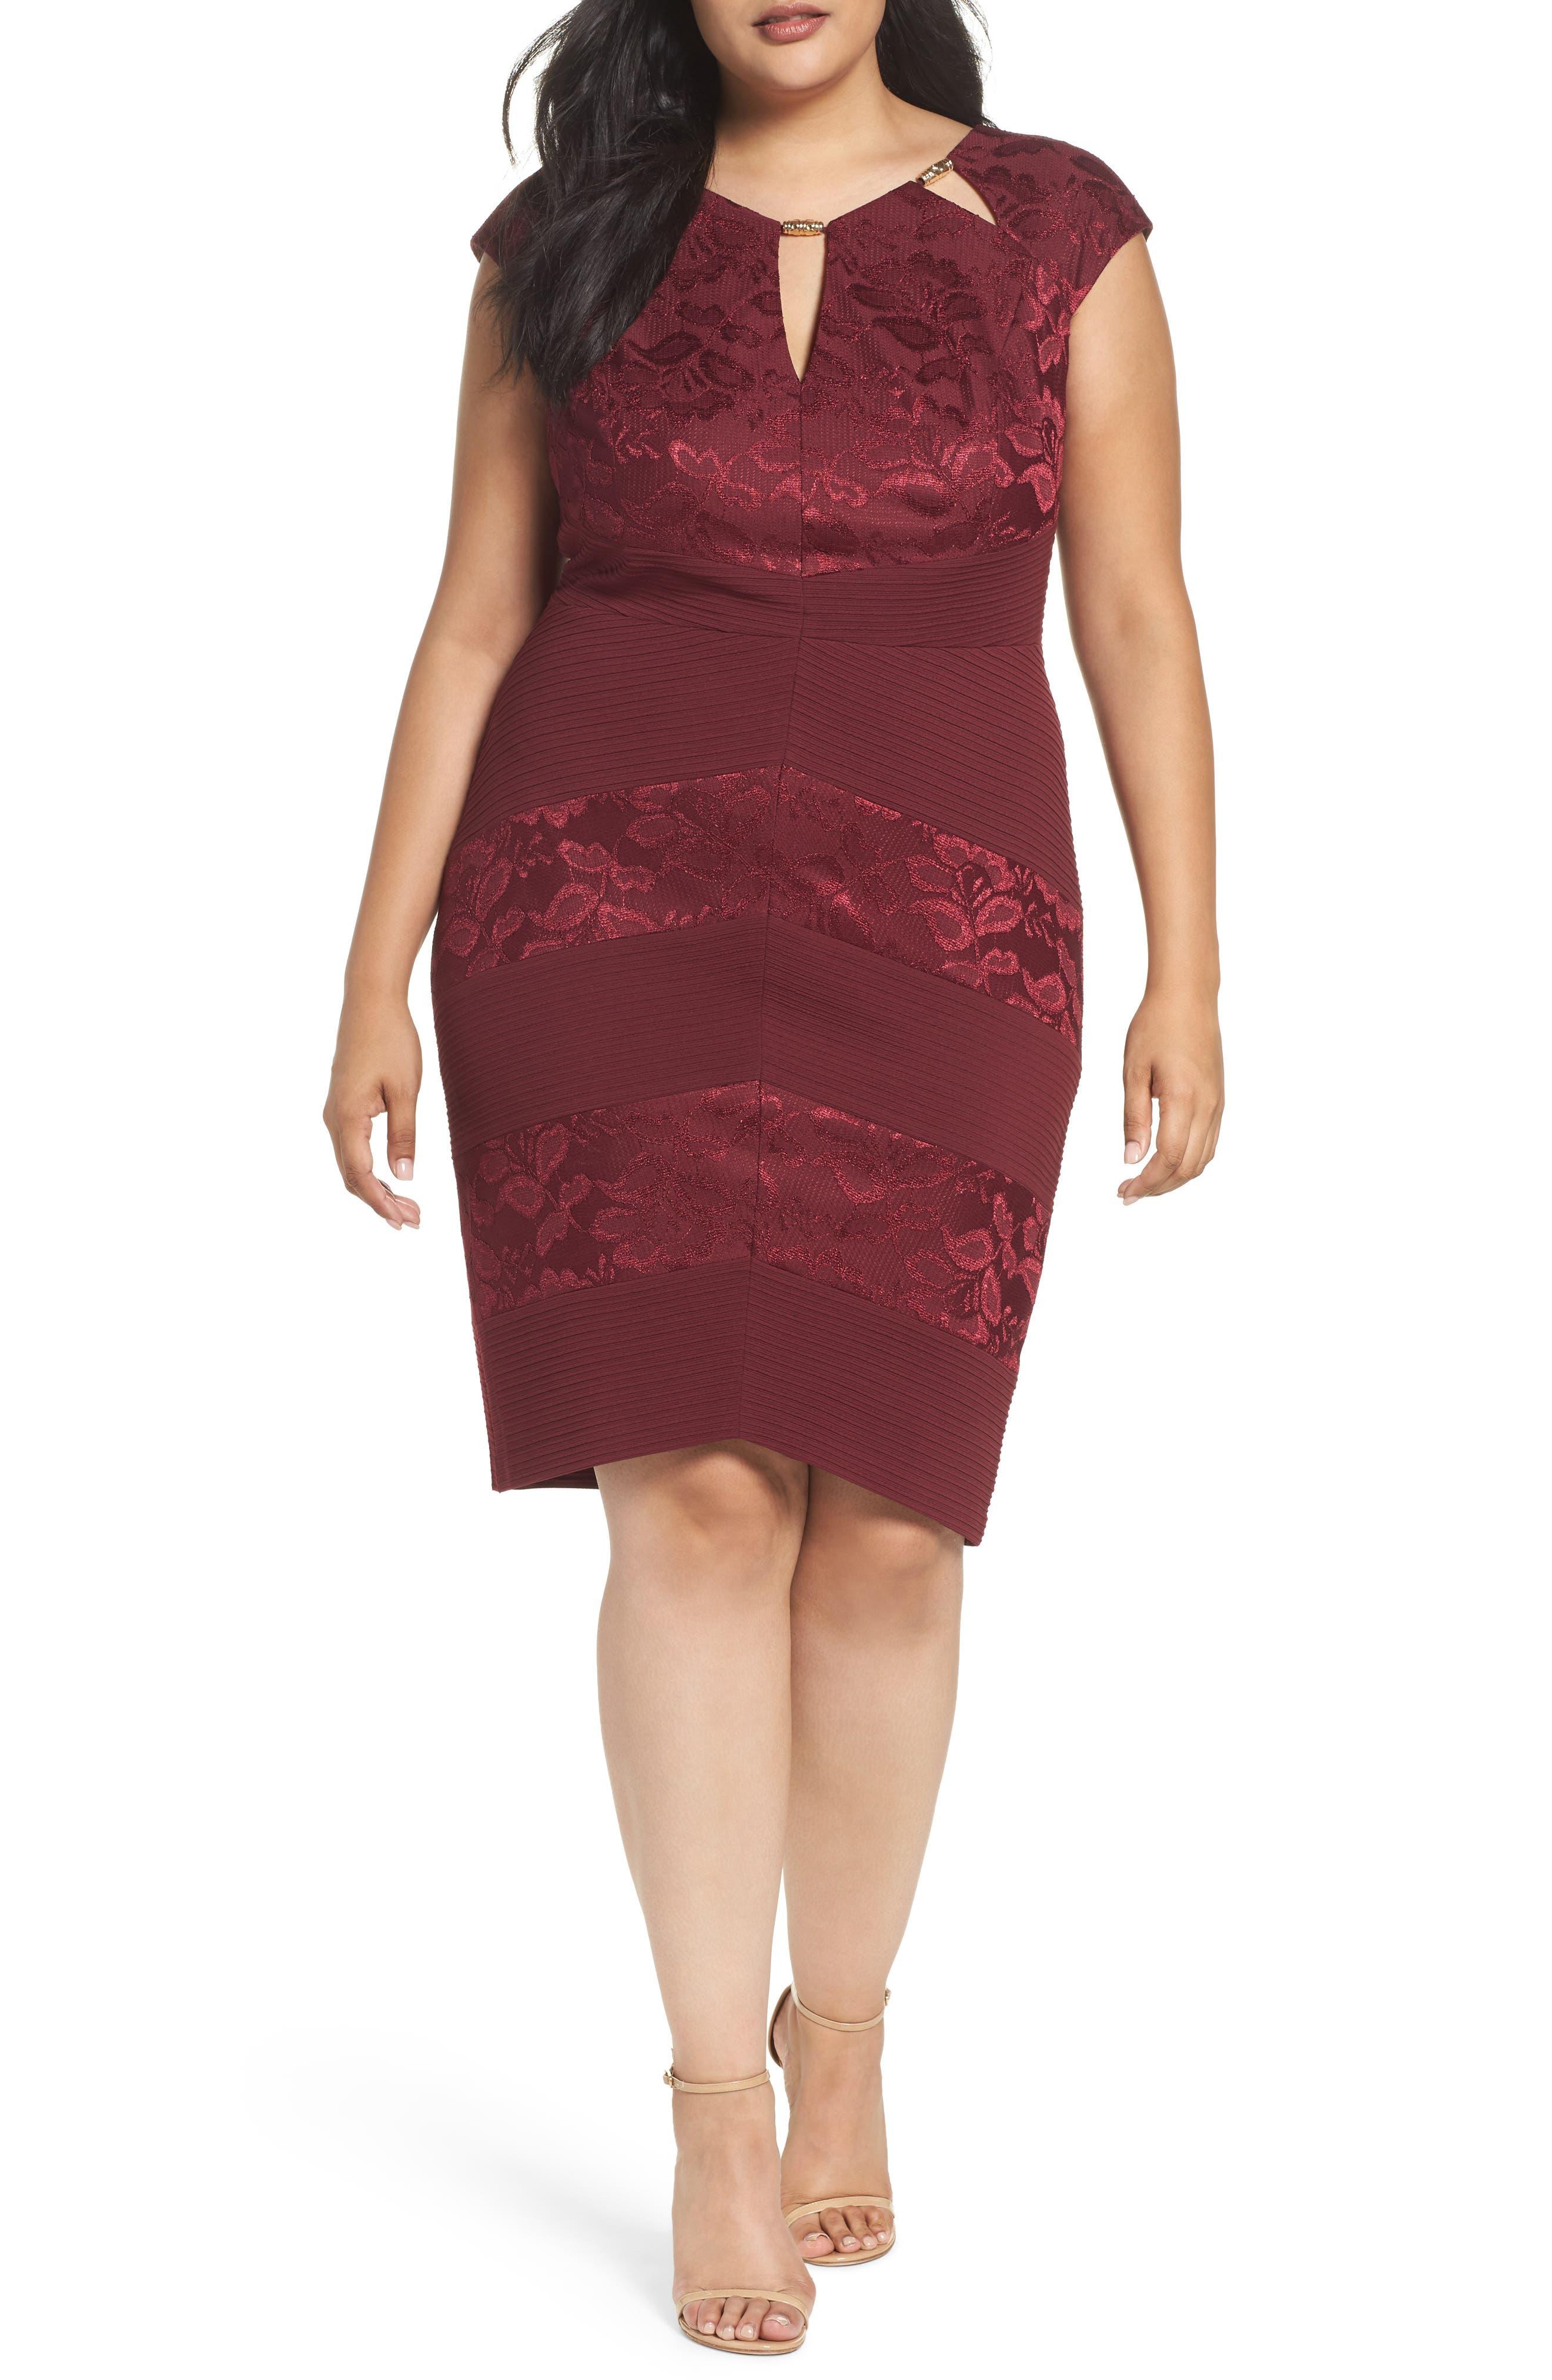 Alternate Image 1 Selected - Sangria Cutout Neck Sheath Dress (Plus Size)